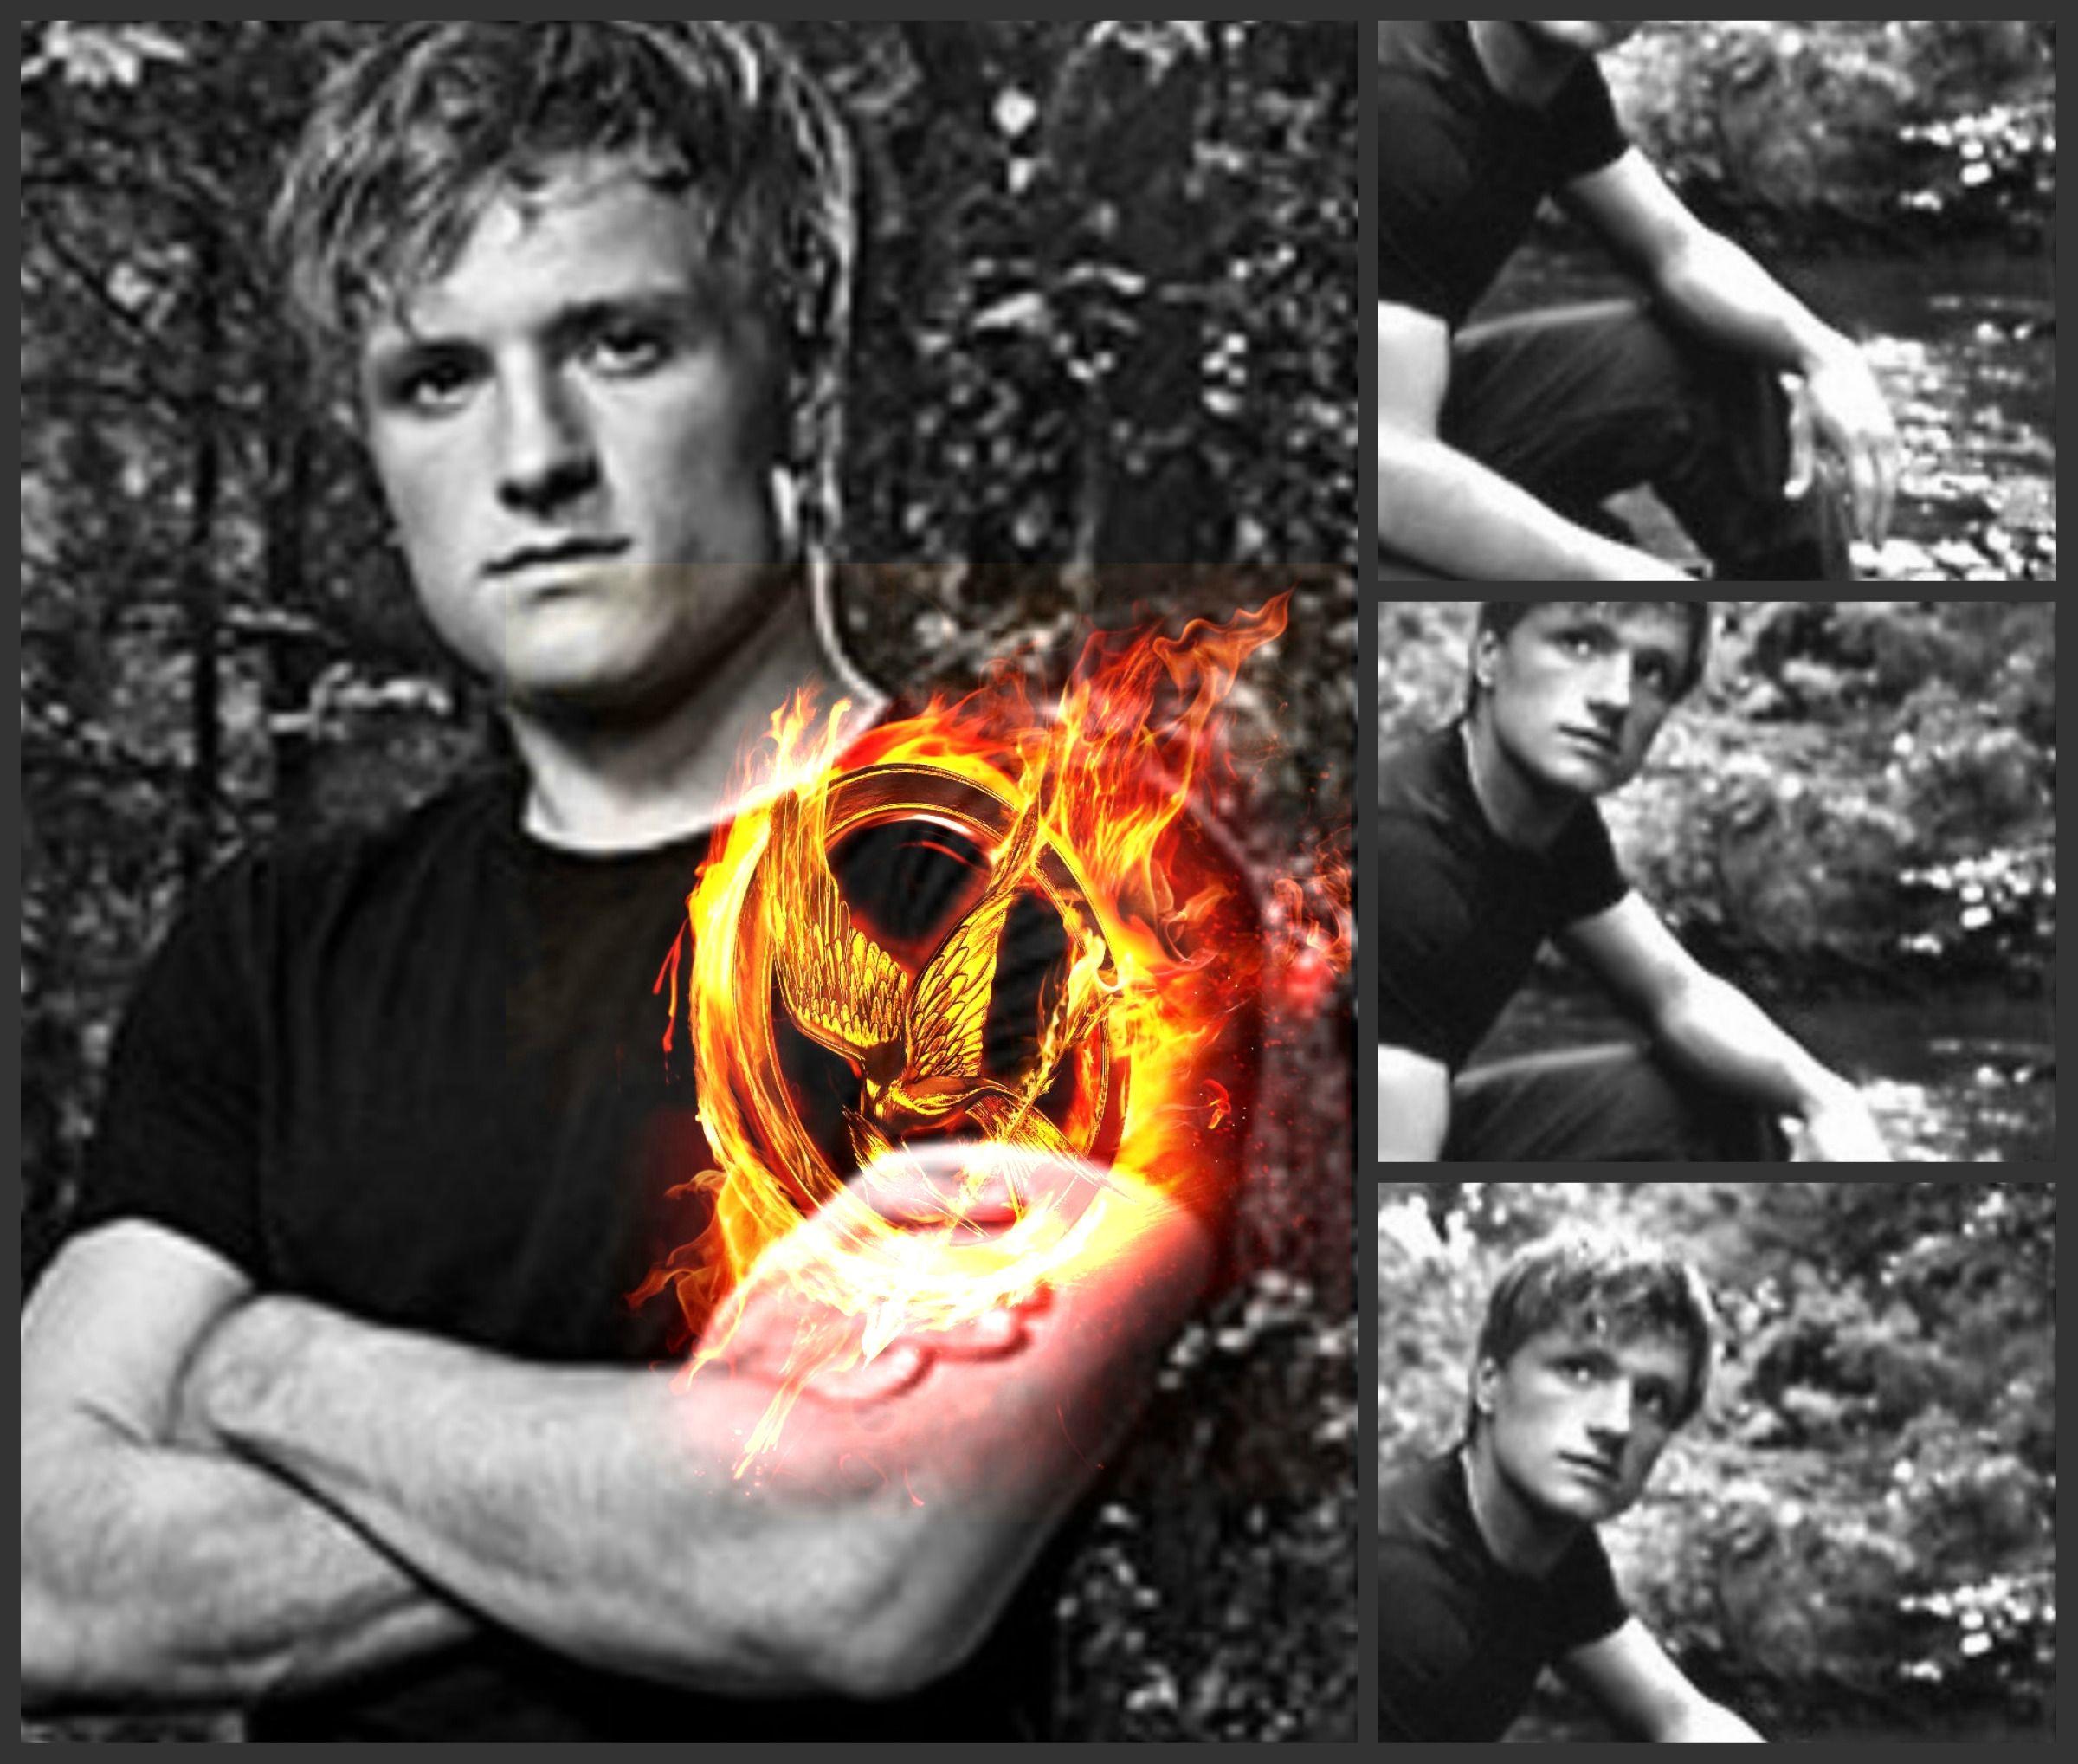 the hunger games images | Peeta - The Hunger Games Fan Art (24641256) - Fanpop fanclubs